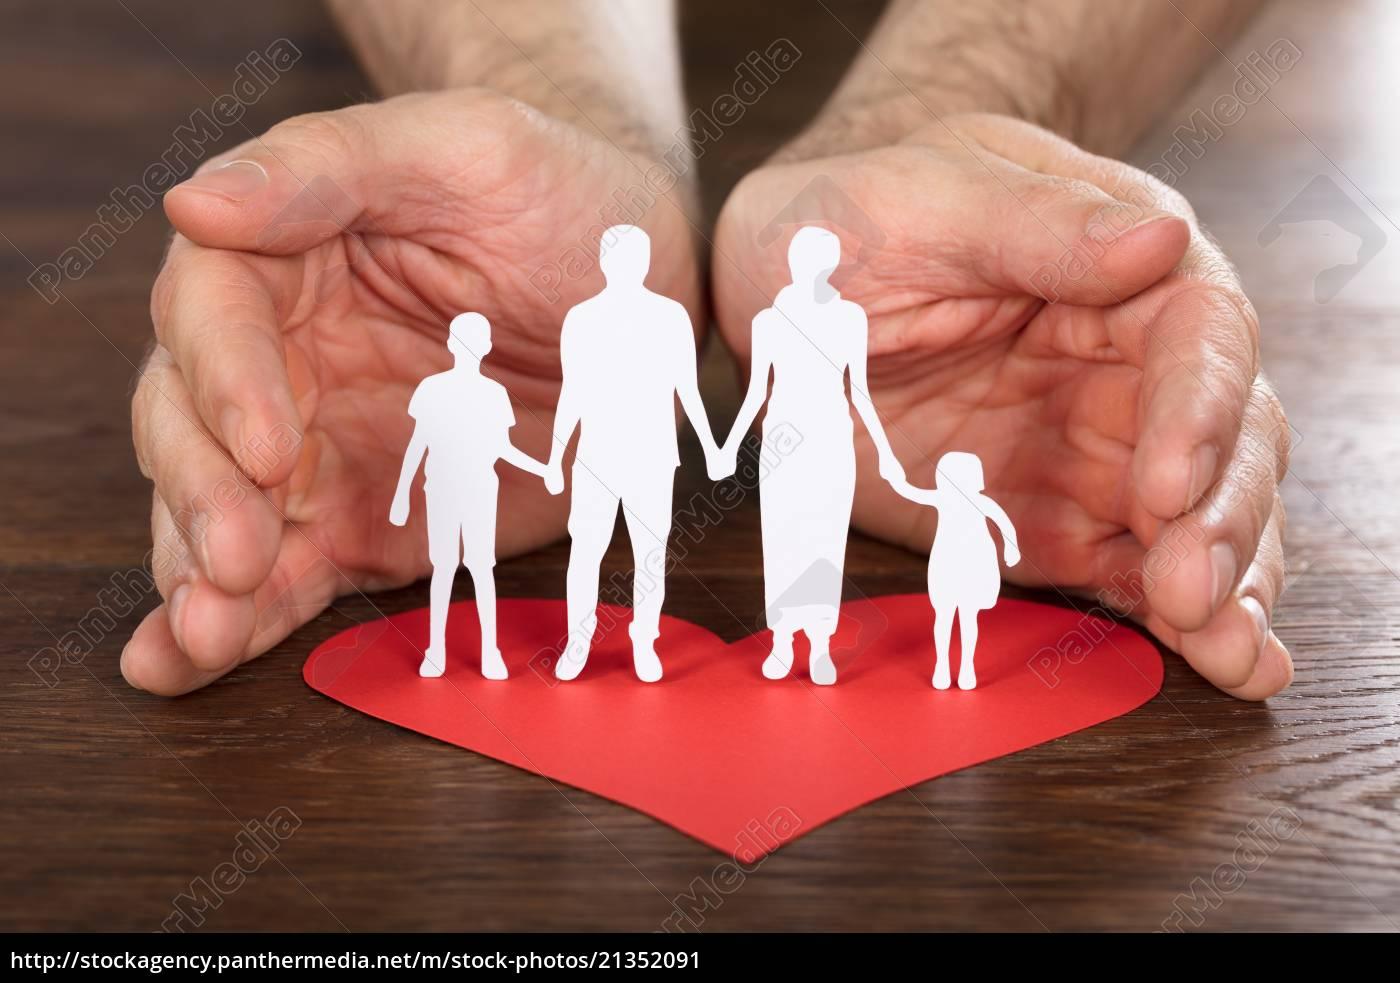 person, hand, schutz, familie, papier, schnitt - 21352091